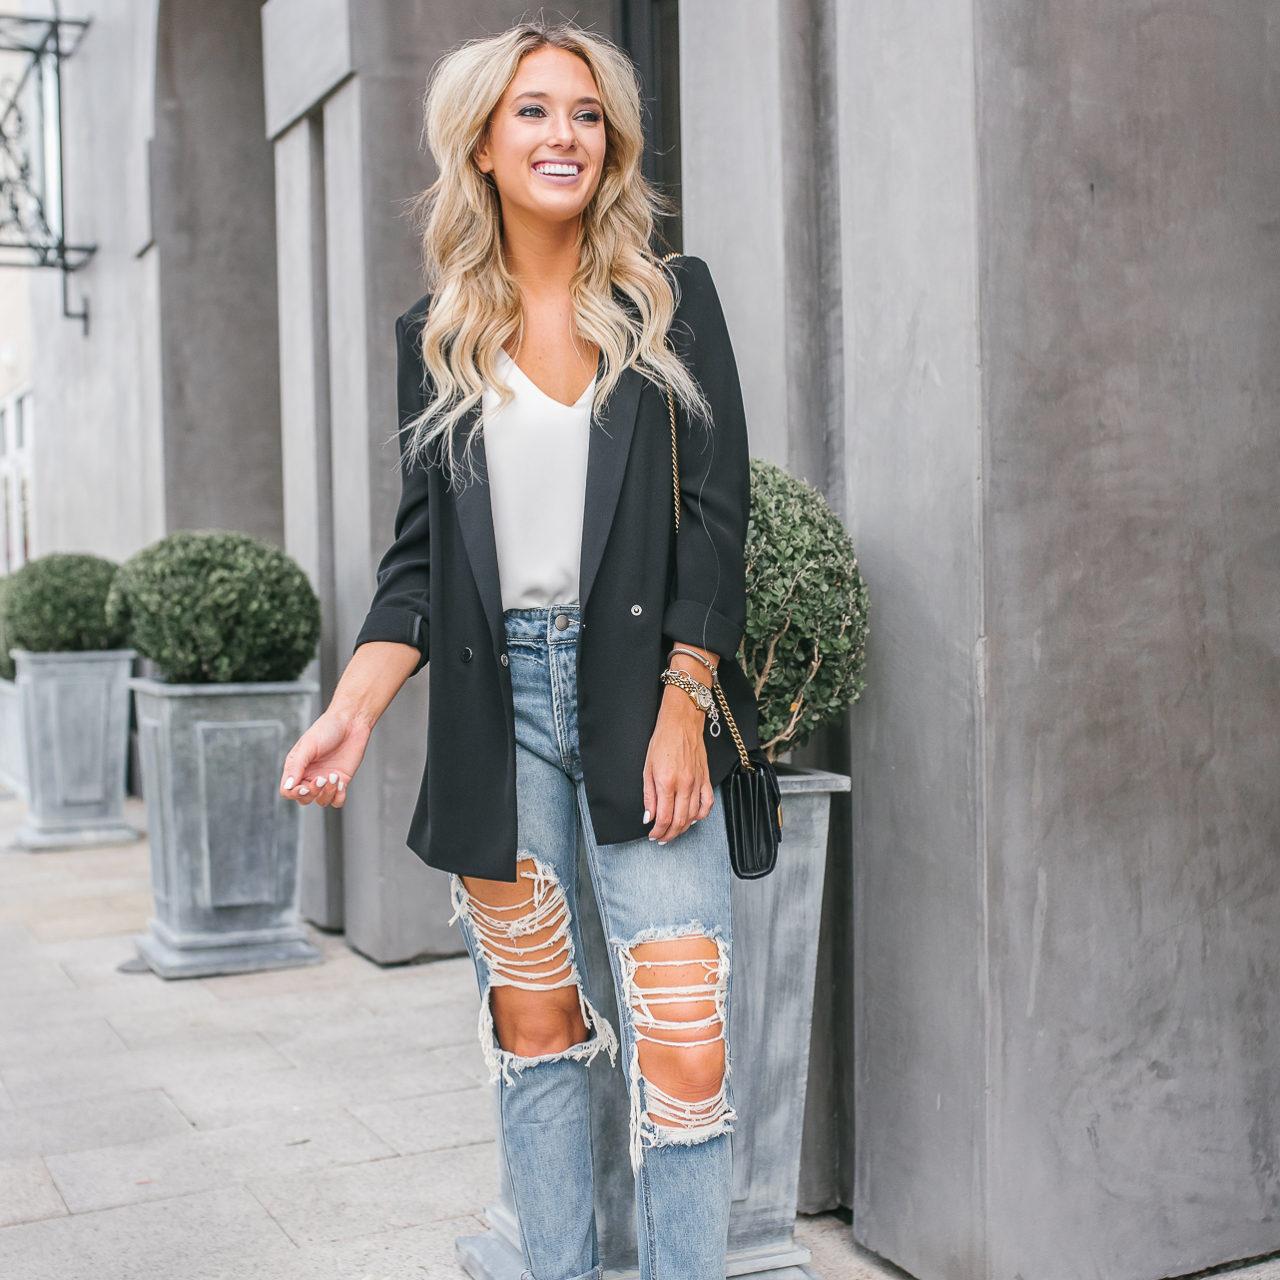 Blazer & Ripped Jeans